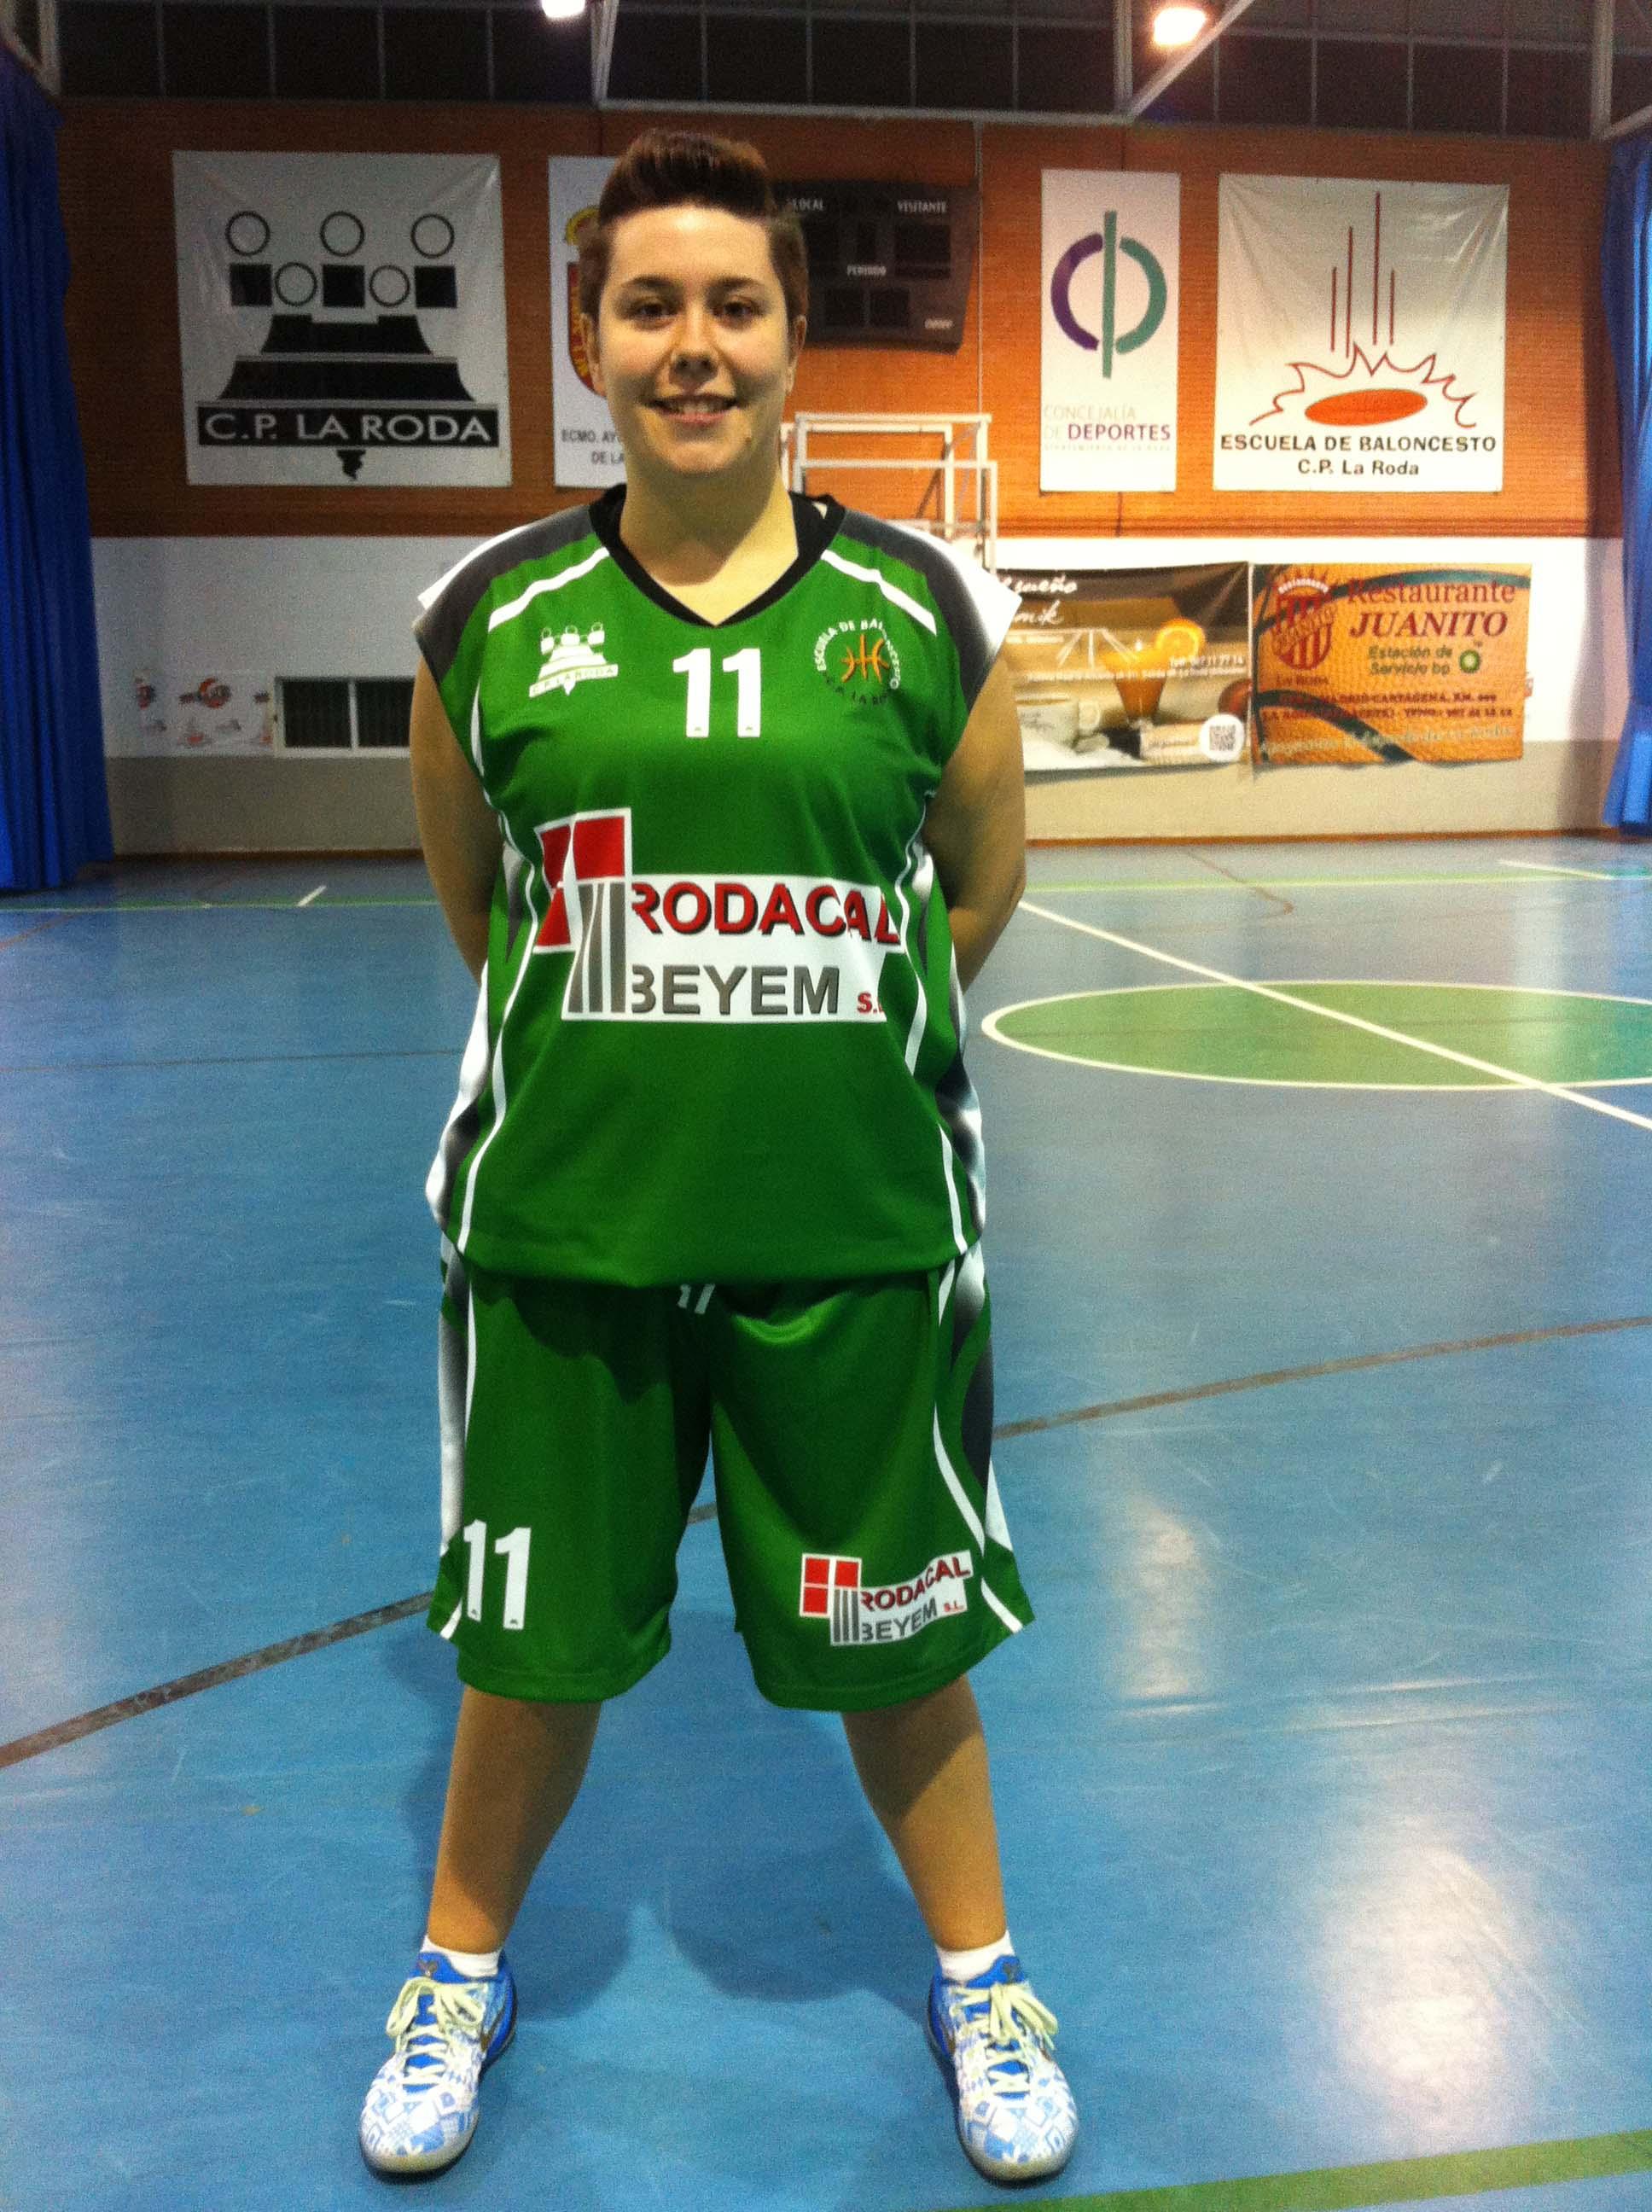 Sagra Tebar, jugadora del Rodacal Beyem CP La Roda